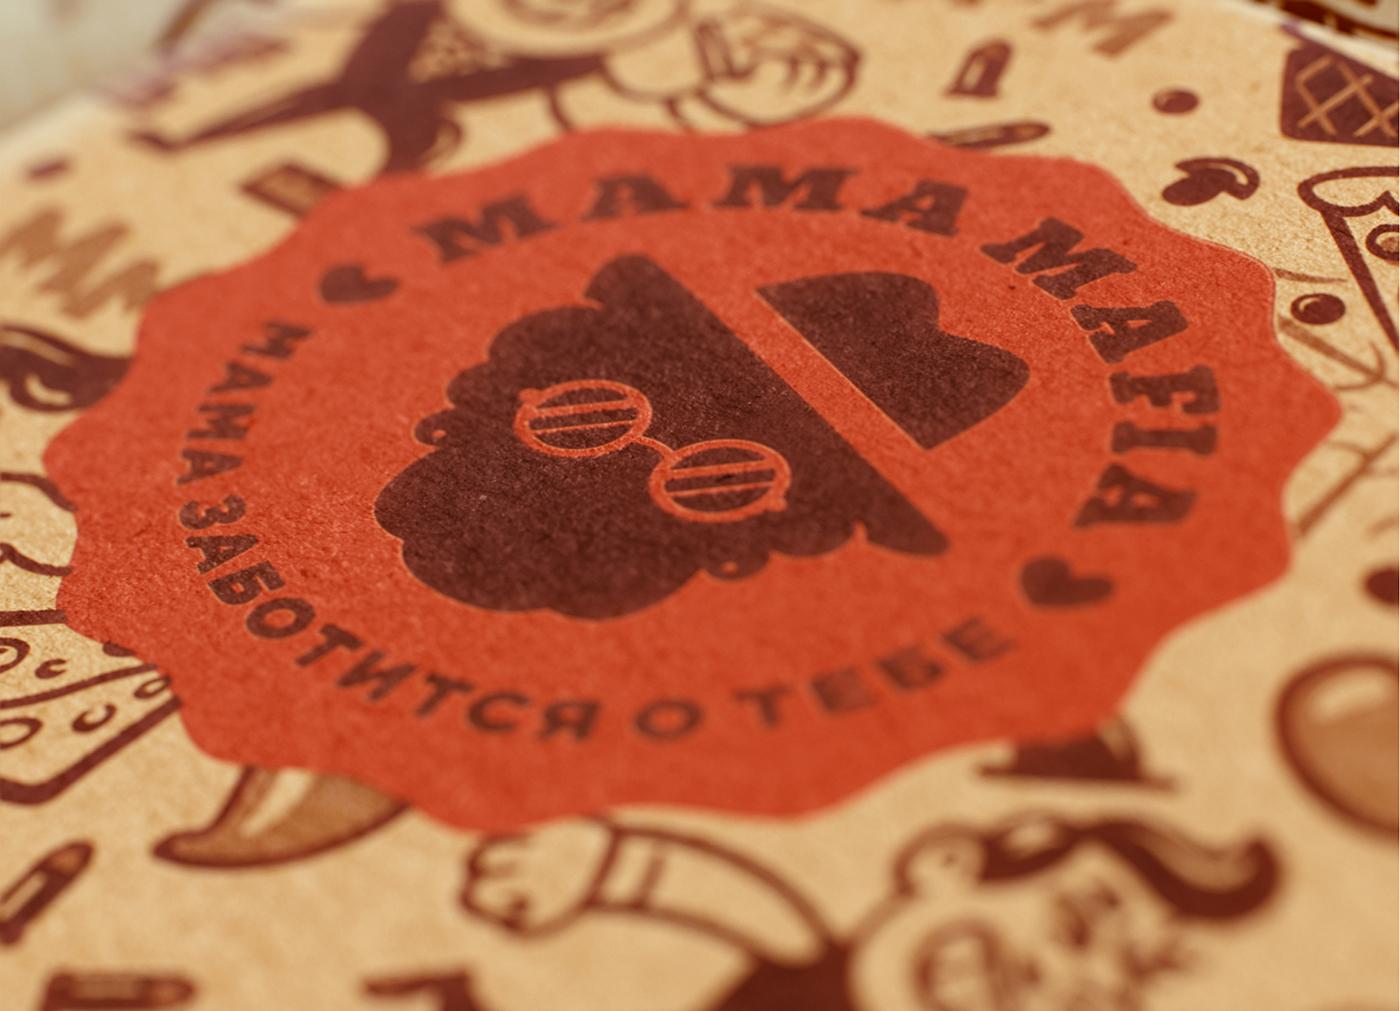 mafia Pizza yakudza Food  Coffee restaurant Sushi rolls japan italia funny vintage cartoon pattern Russia